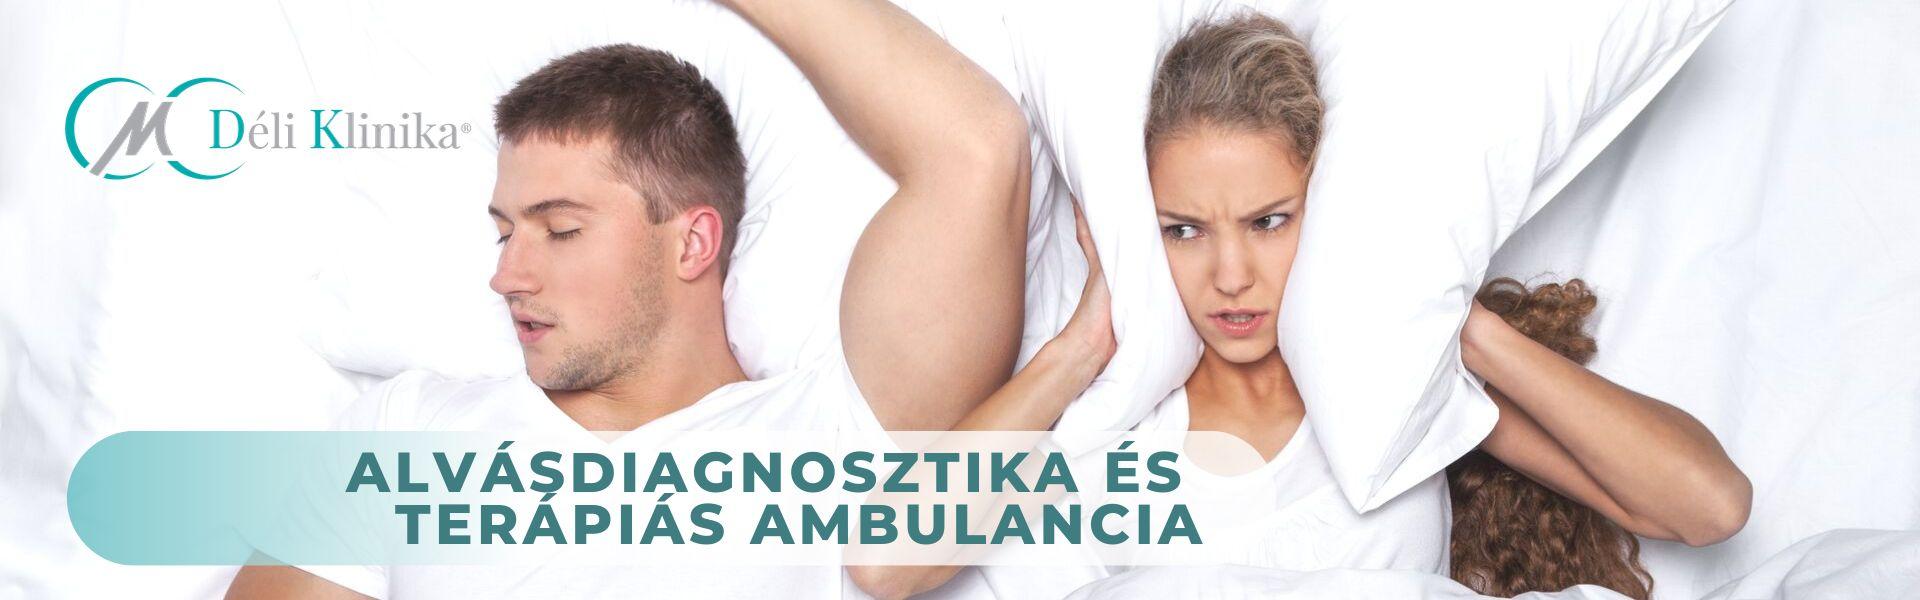 alvasdiagnosztika-es-terapias-ambulancia